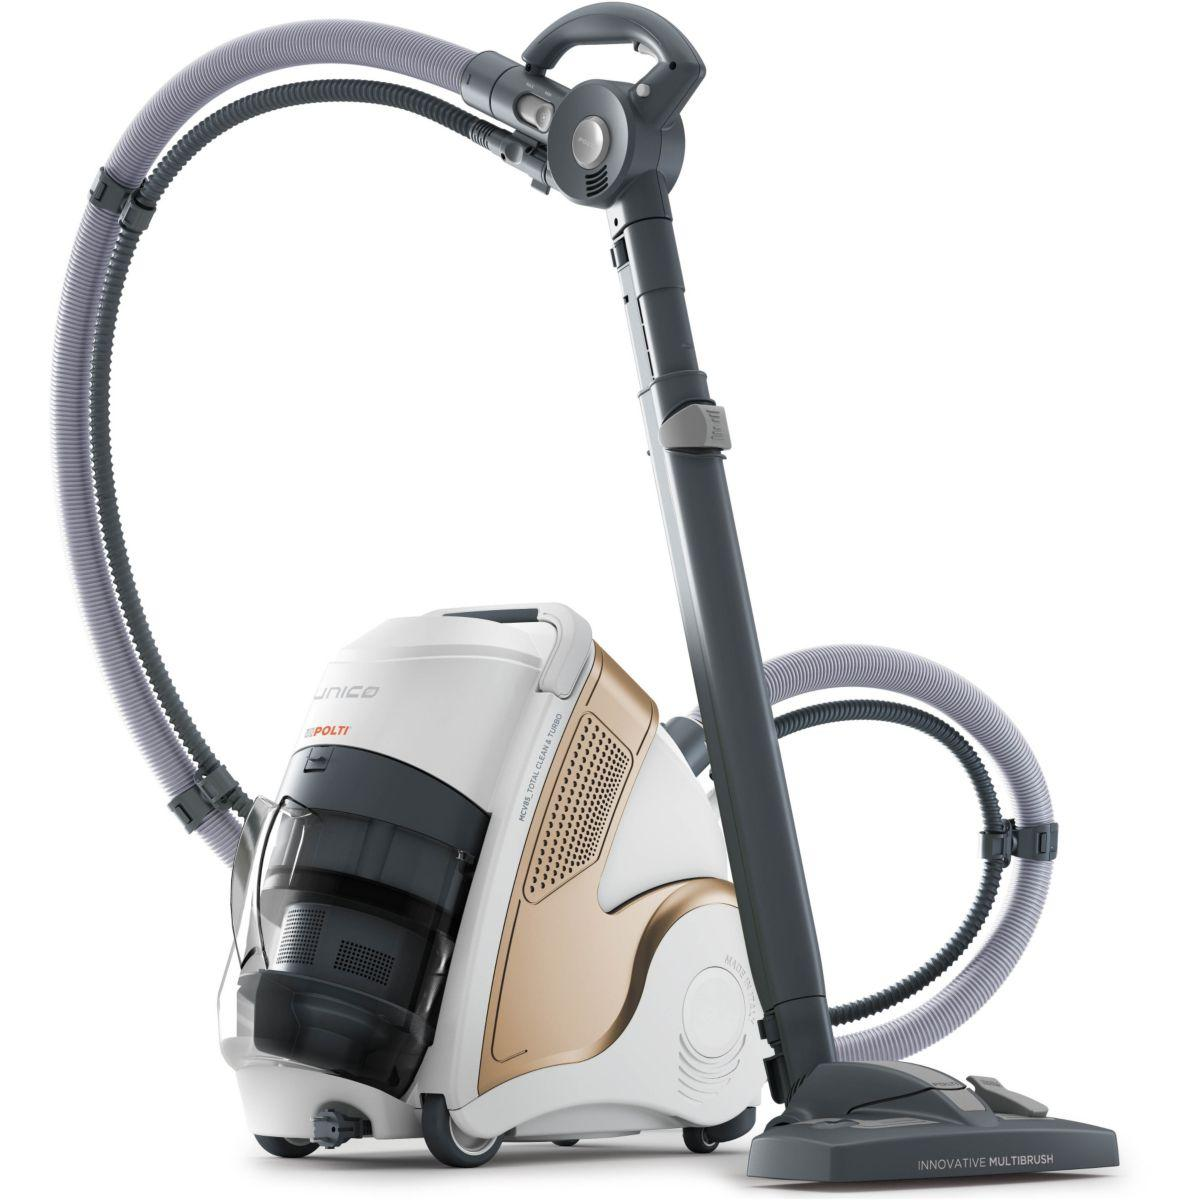 Aspirateur nettoyeur vapeur POLTI UNICO MCV85 TOTAL CLEAN & TURBO